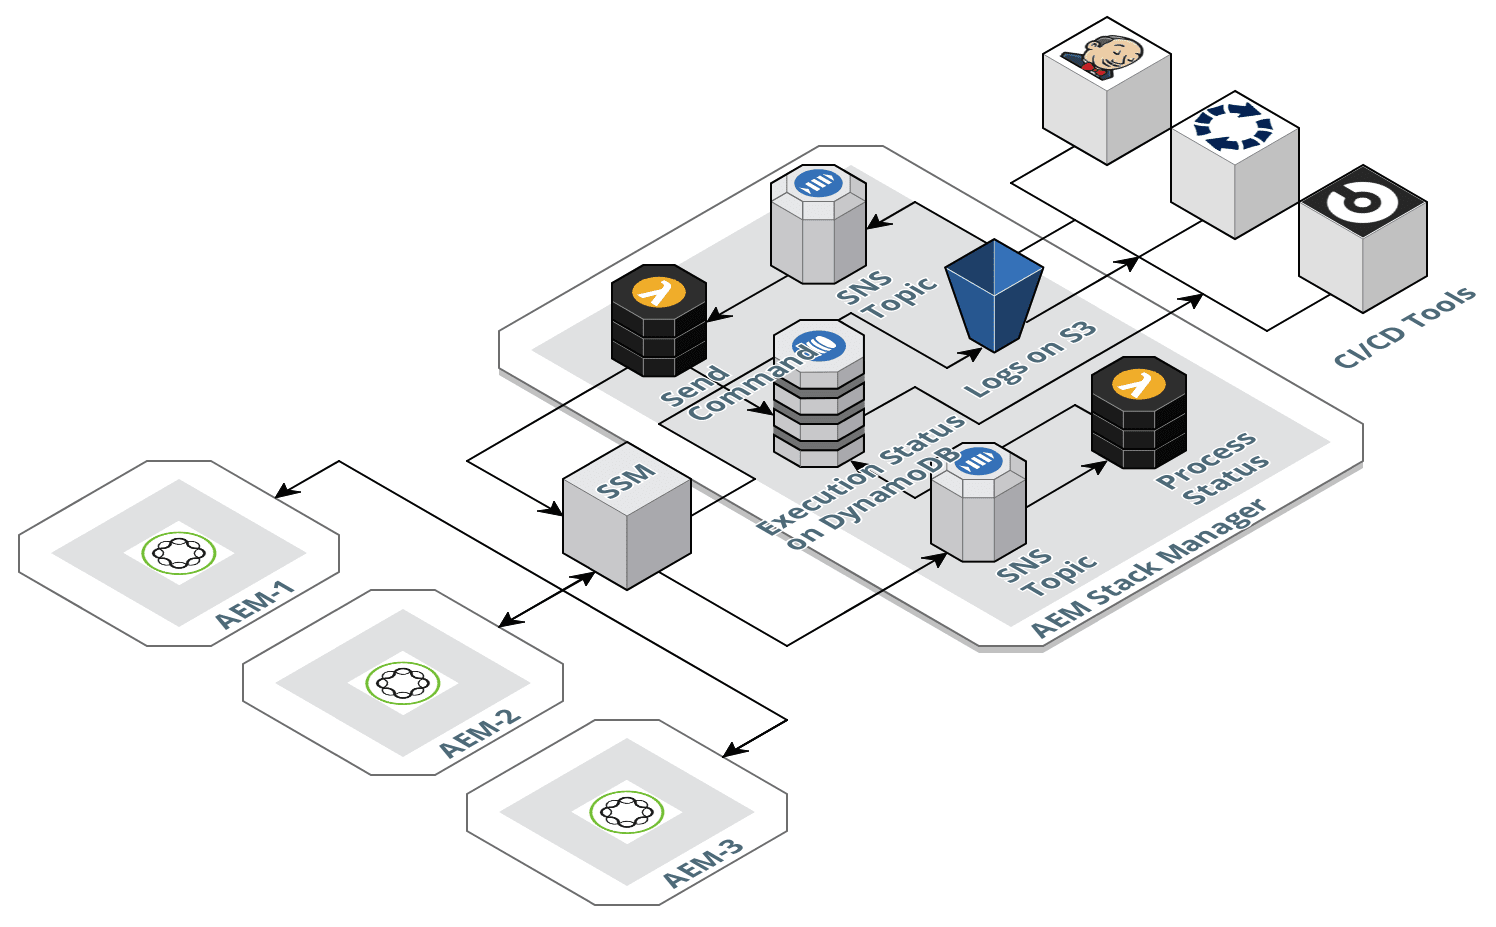 AEM Stack Manager Diagram